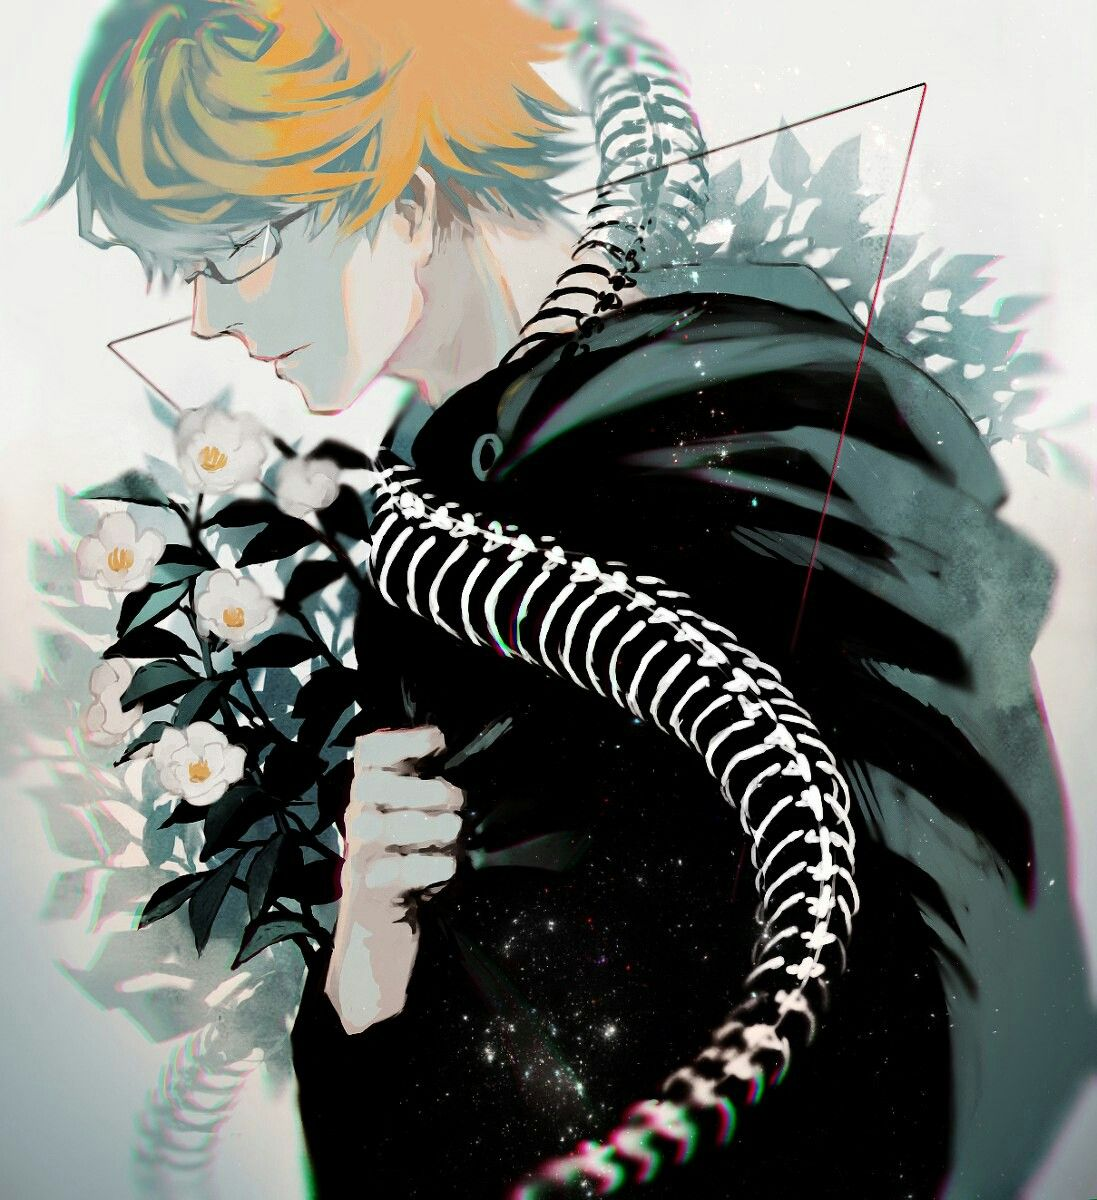 Nishiki Chibi tokyo ghoul, Tokyo ghoul fan art, Anime